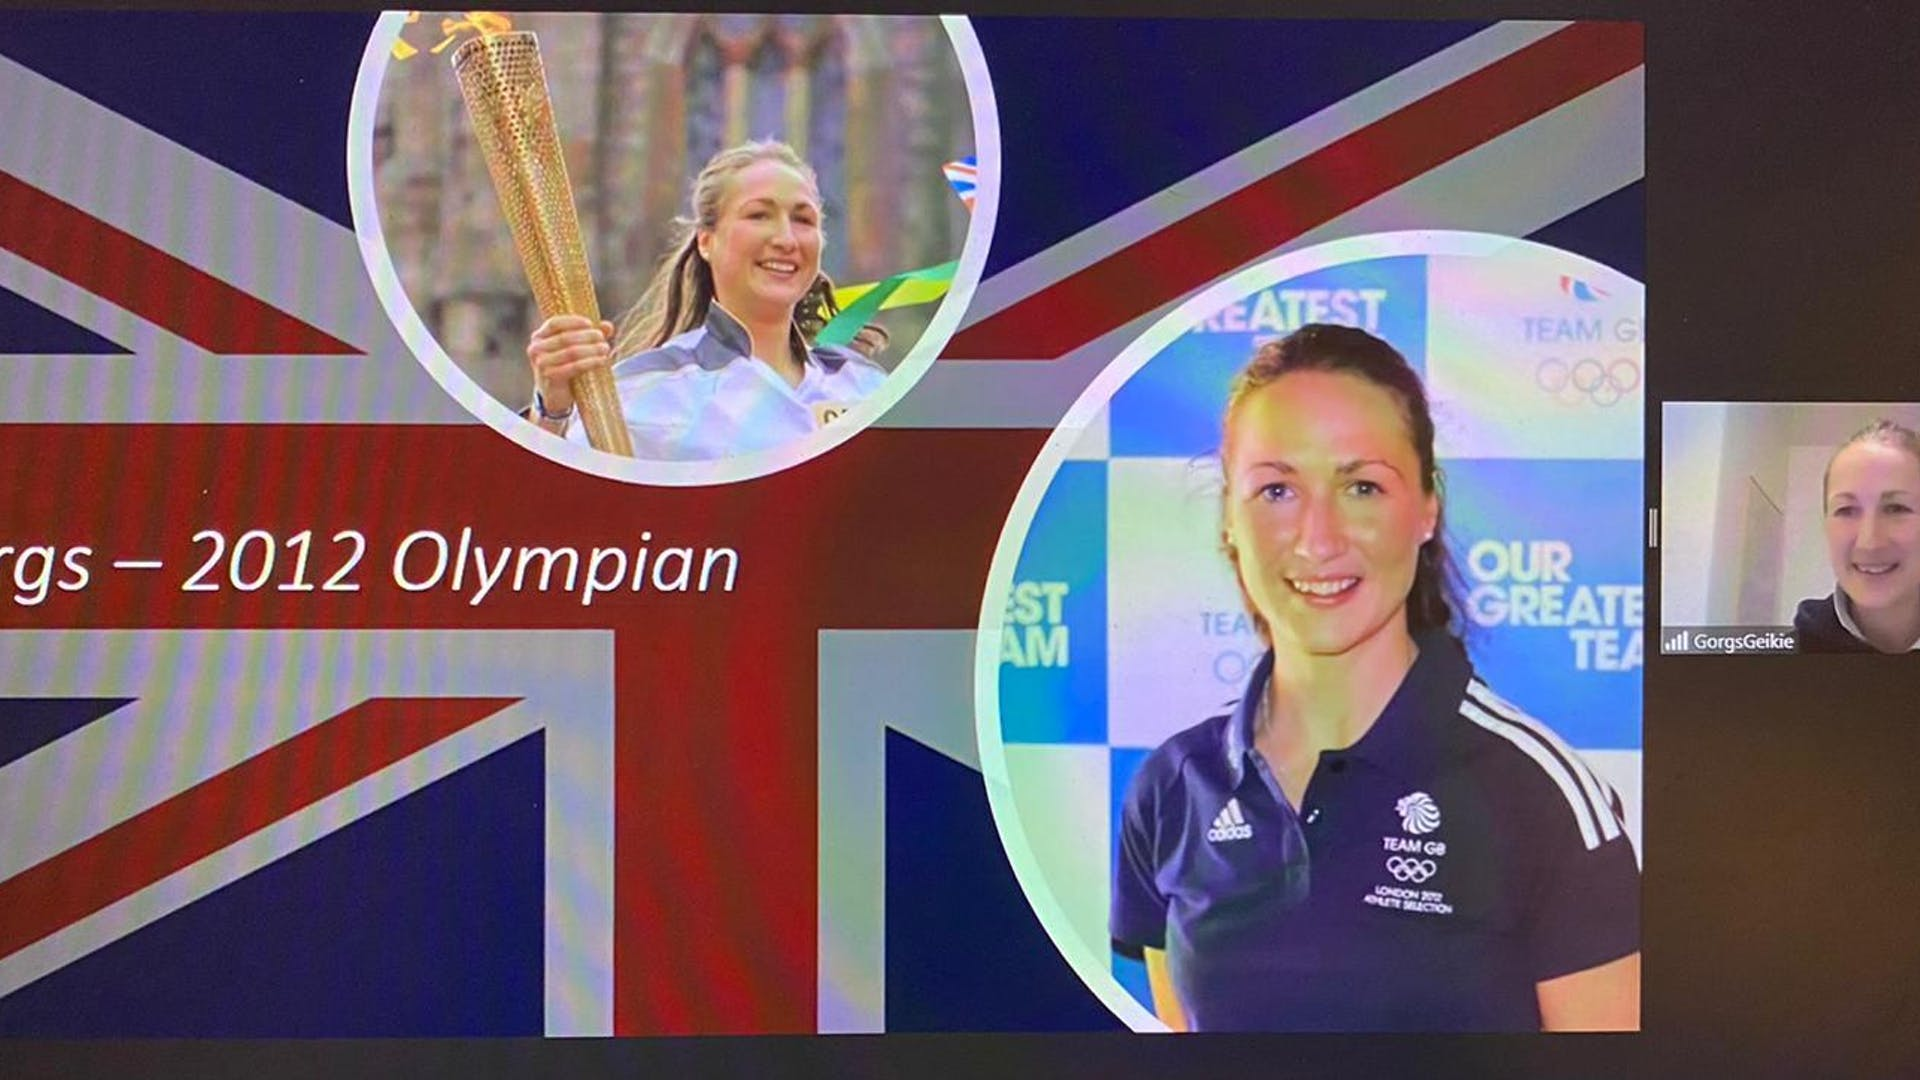 British Olypian Georgina Geikie 1